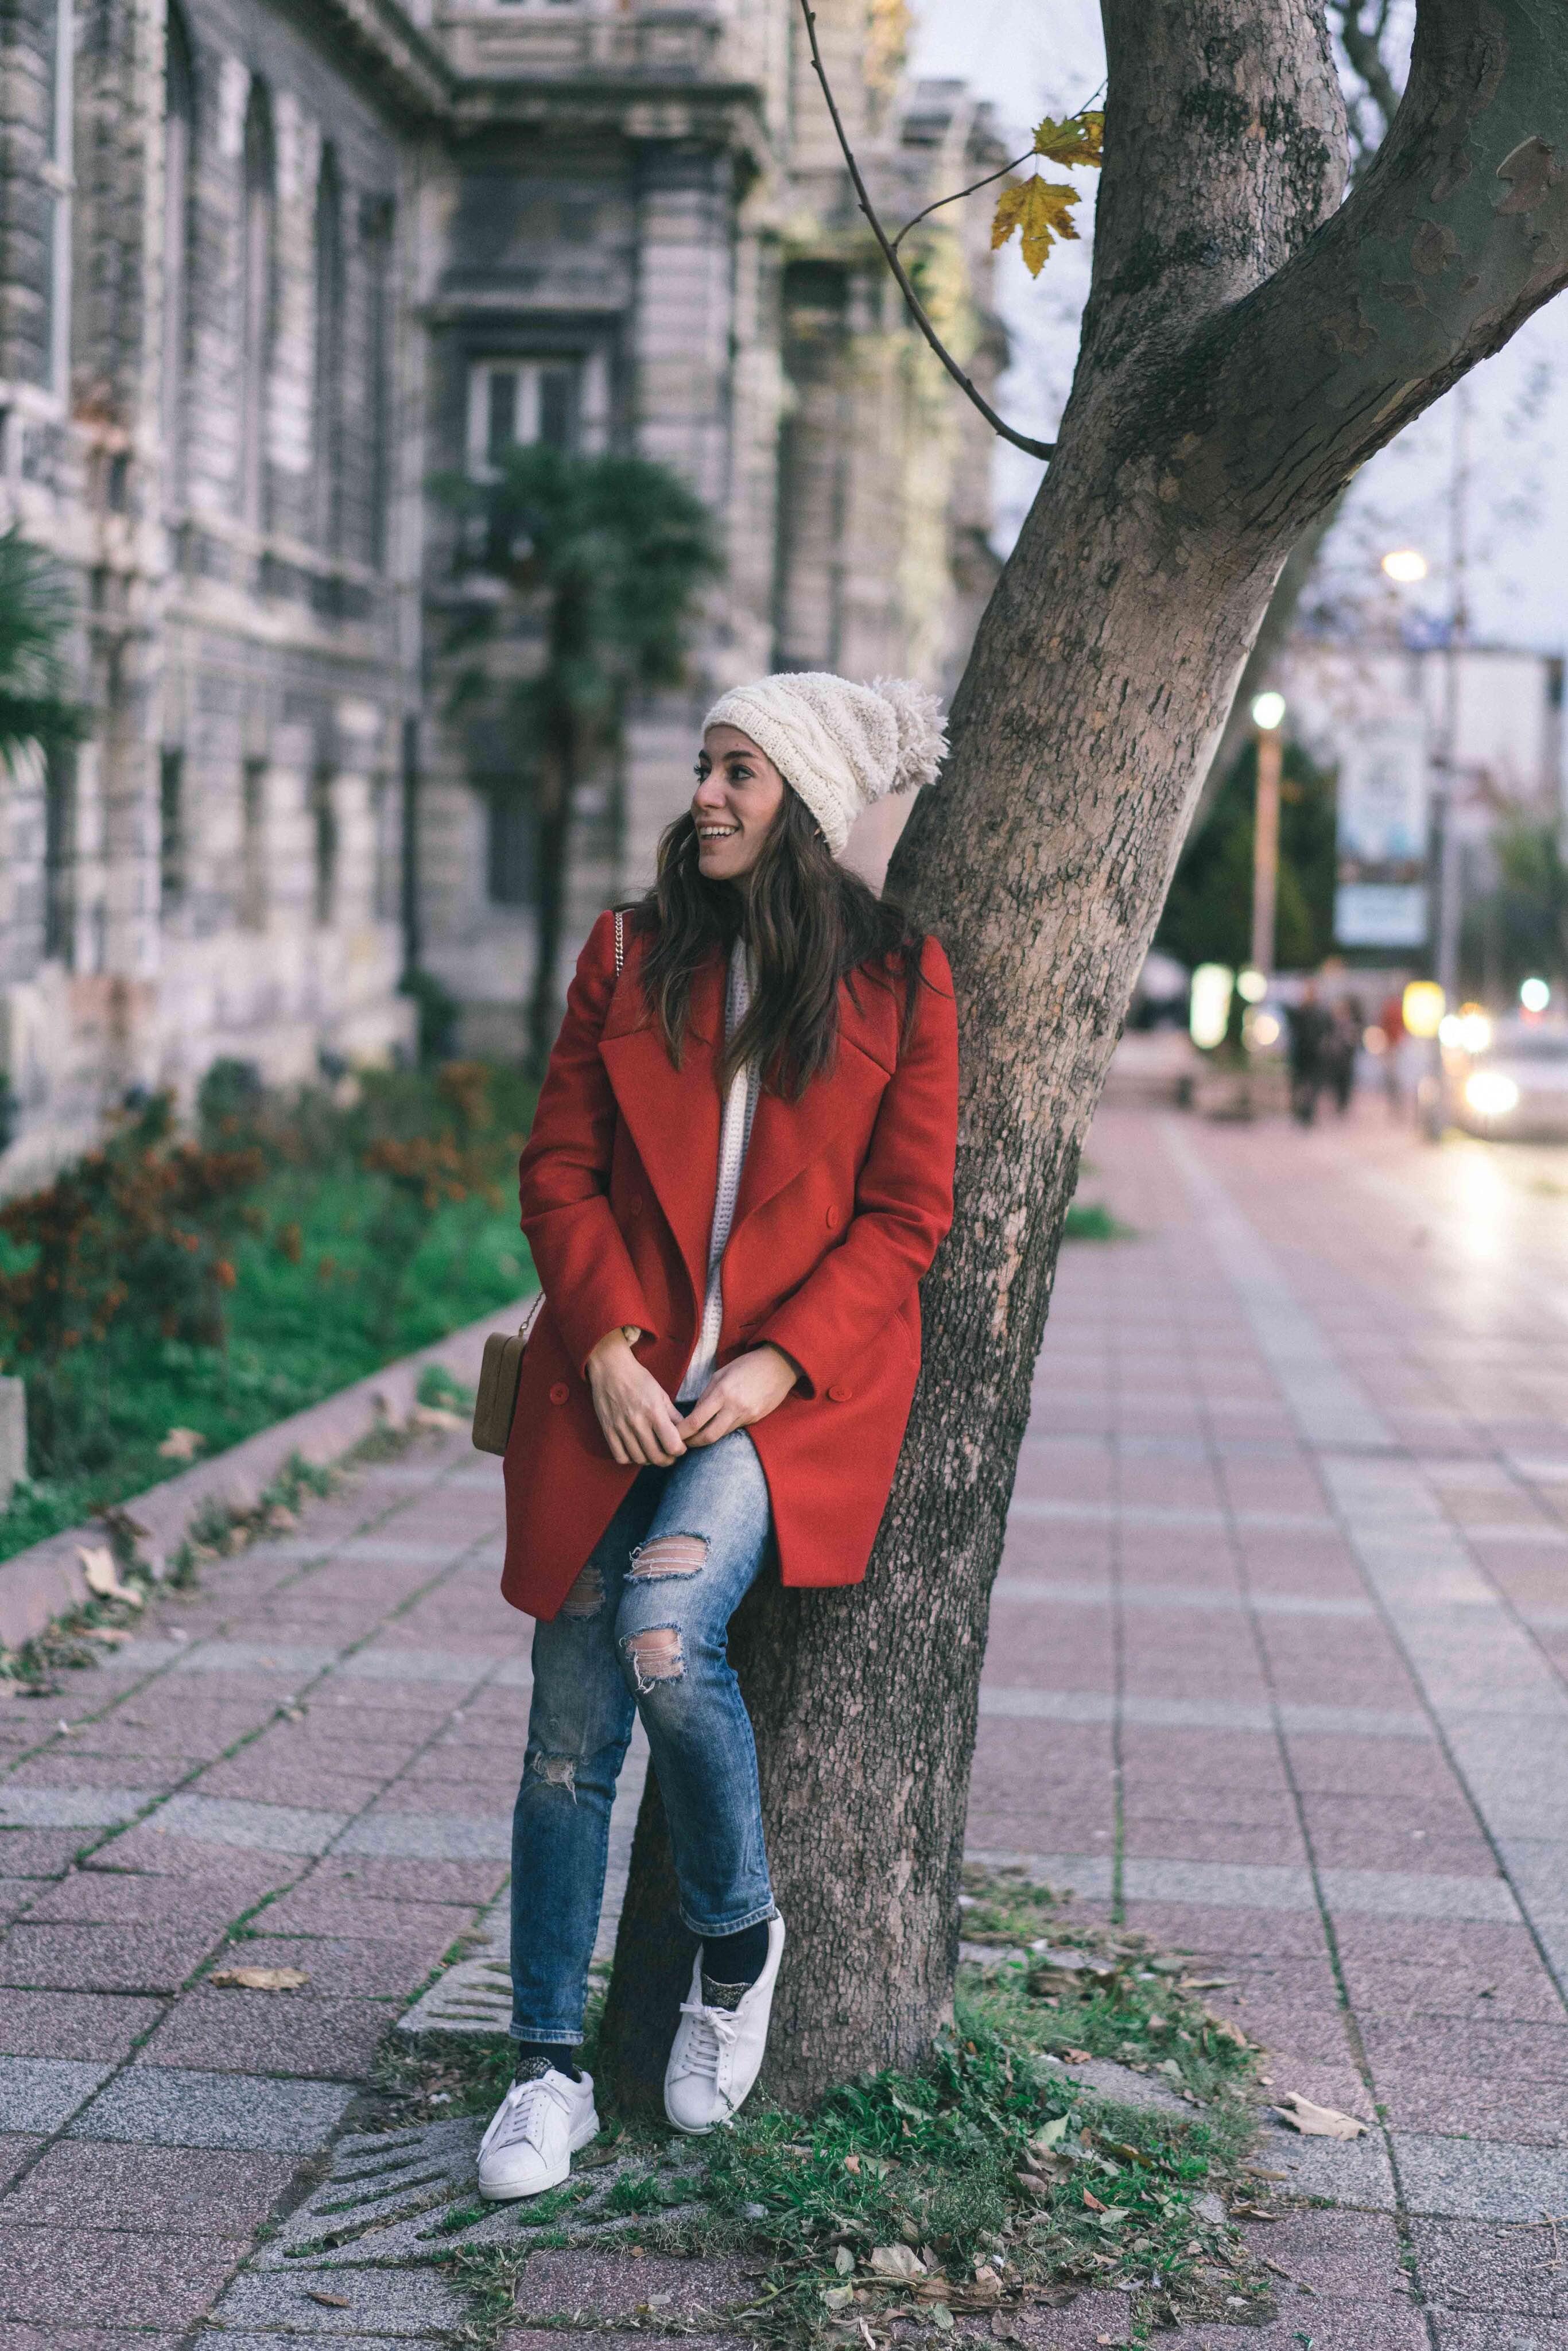 billur saatci, offnegiysem, turkish style blogger, street style, fashion, ootd, blogger, istanbul, carven, grav grav madison 88, massimo dutti, mavi, boyfriend jean,